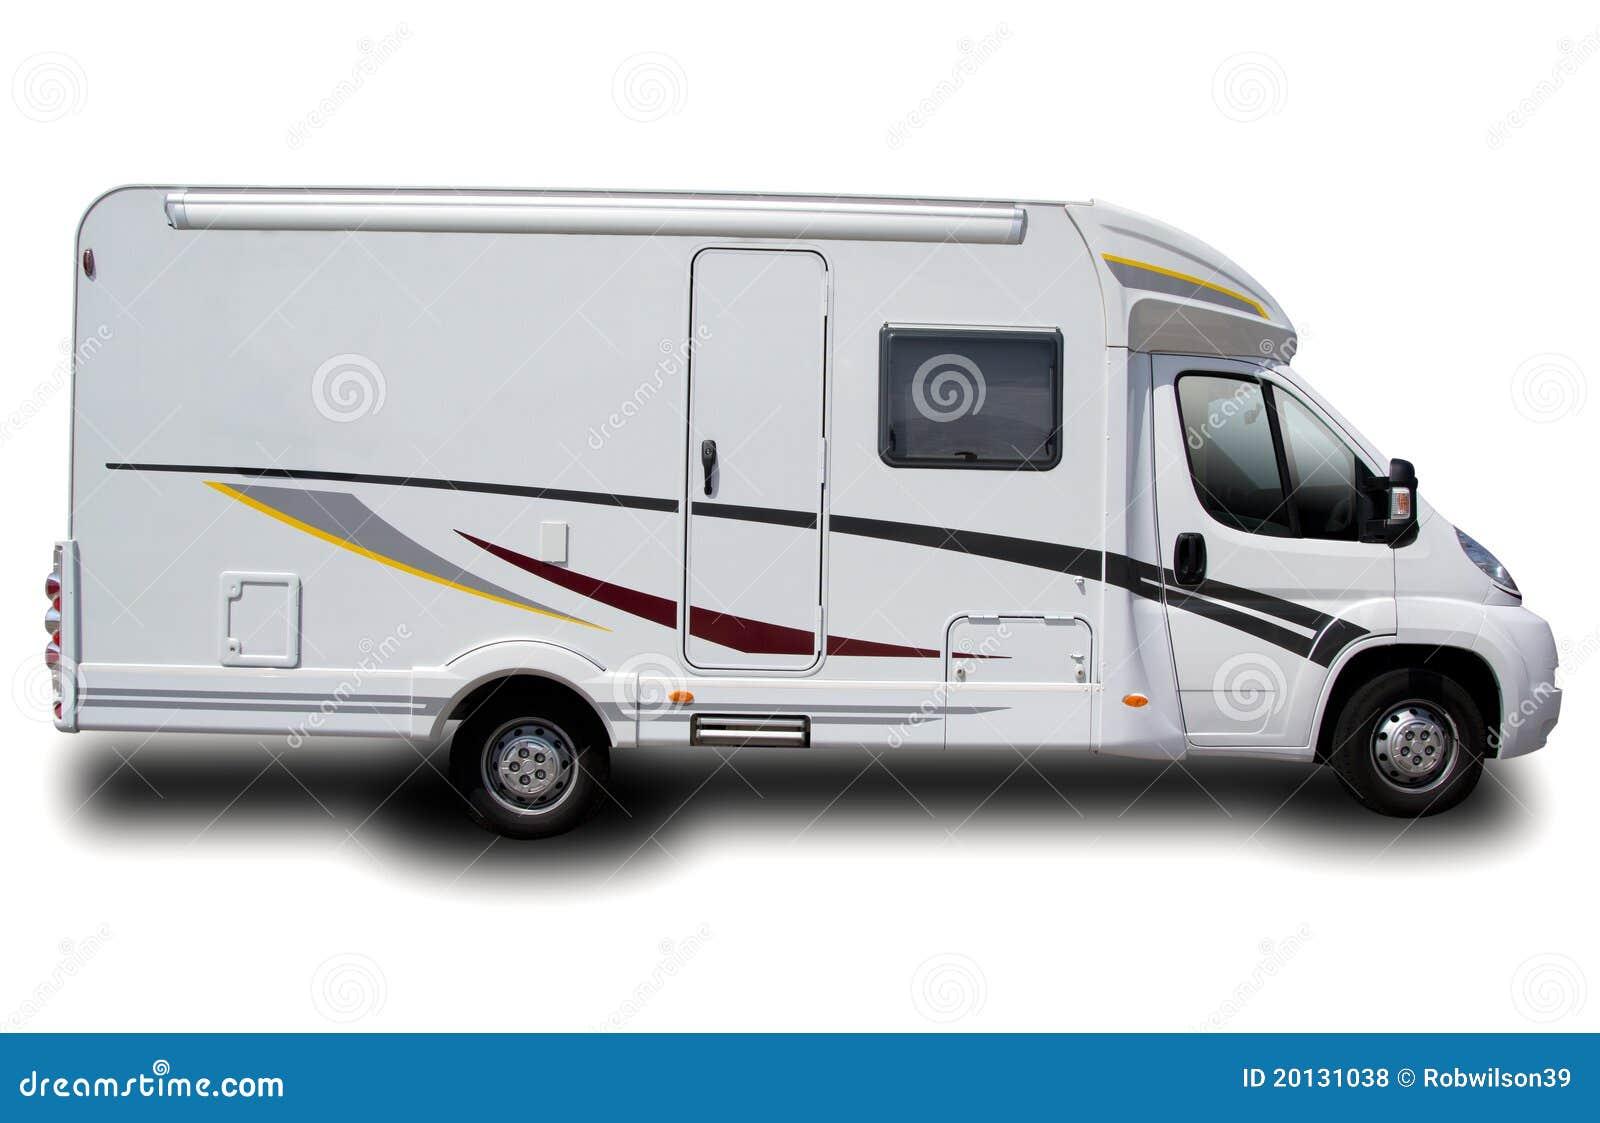 Free Clipart Car And Caravan